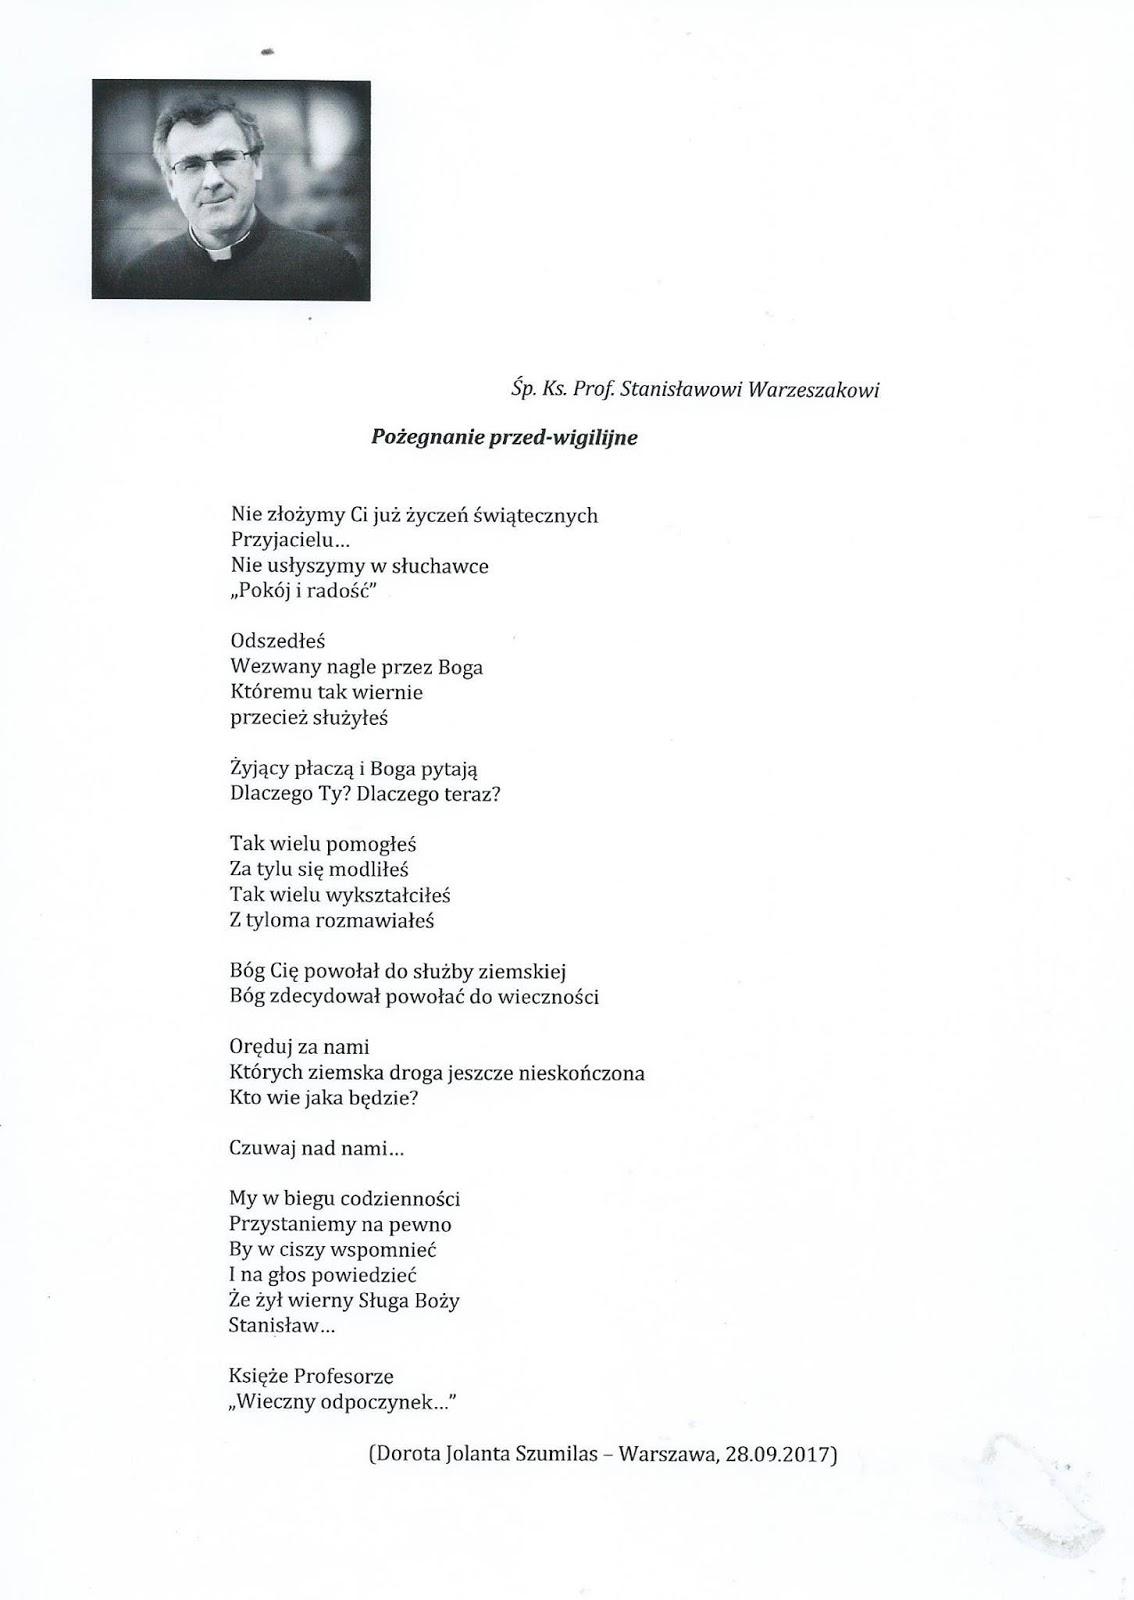 Dorota Jolanta Szumilas Wiersz Pamięci Ks Prof Stanisława